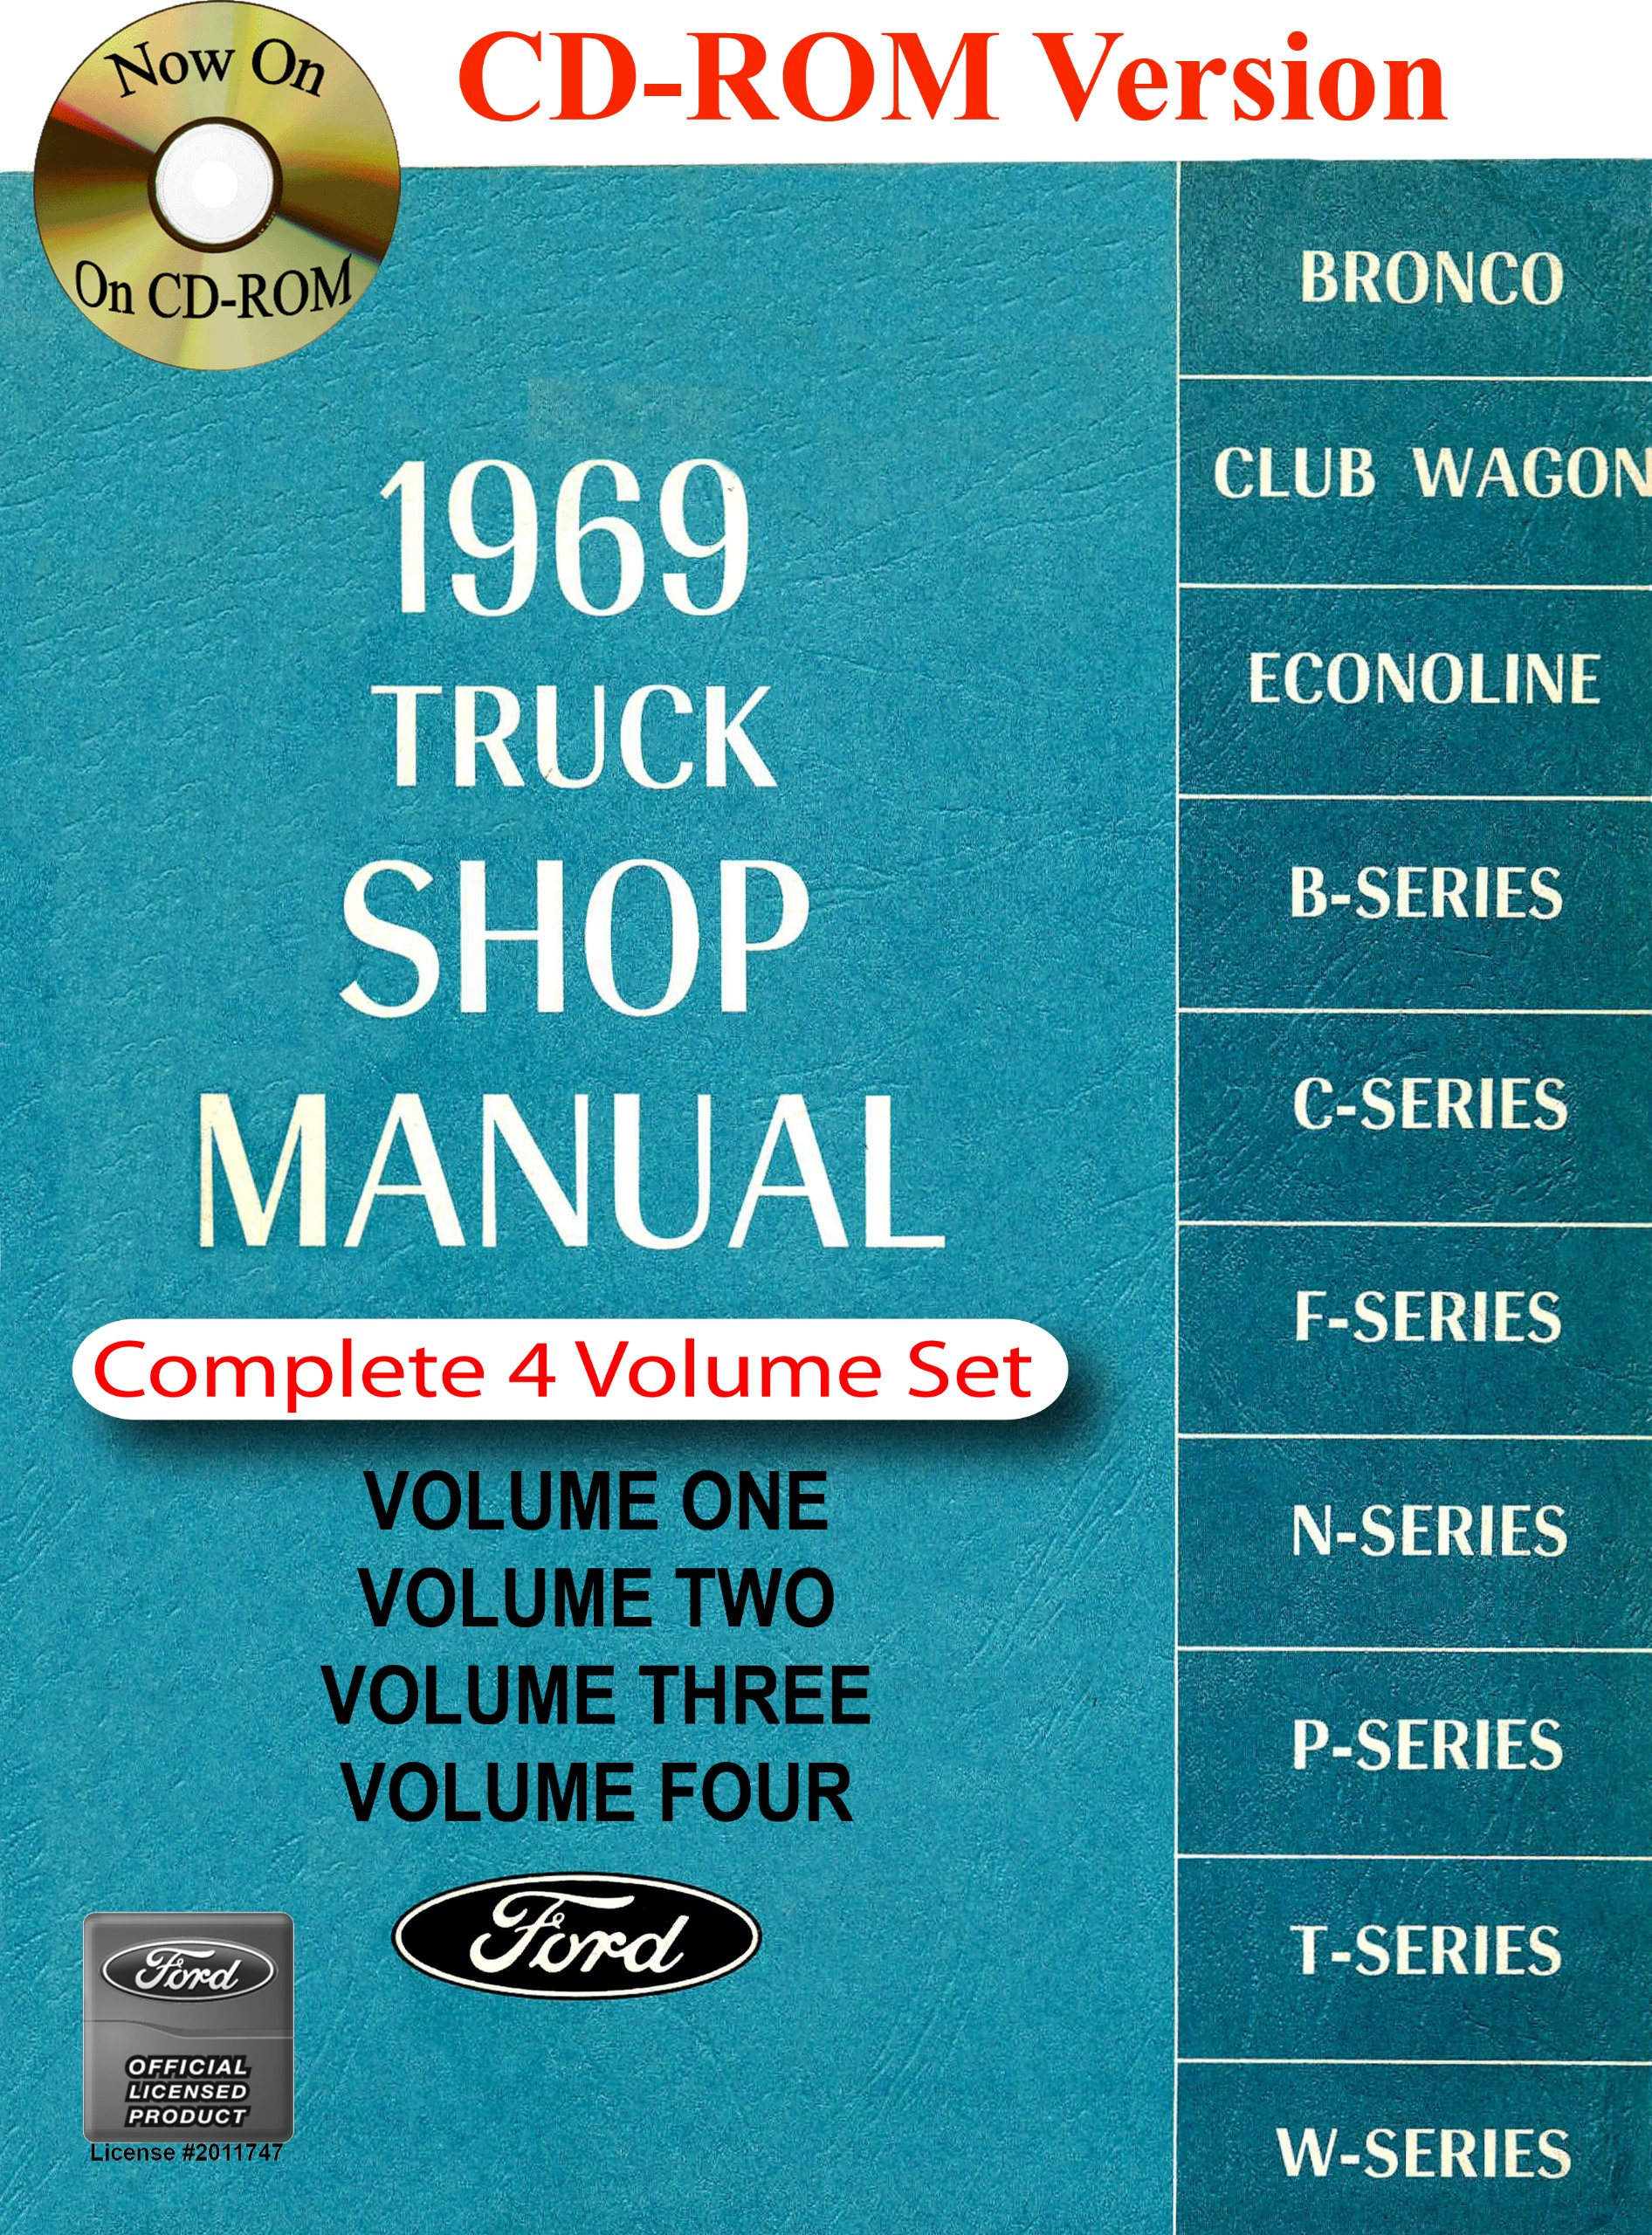 1969 Ford Truck Shop Manual: Ford Motor Company, David E. LeBlanc:  9781603710770: Amazon.com: Books